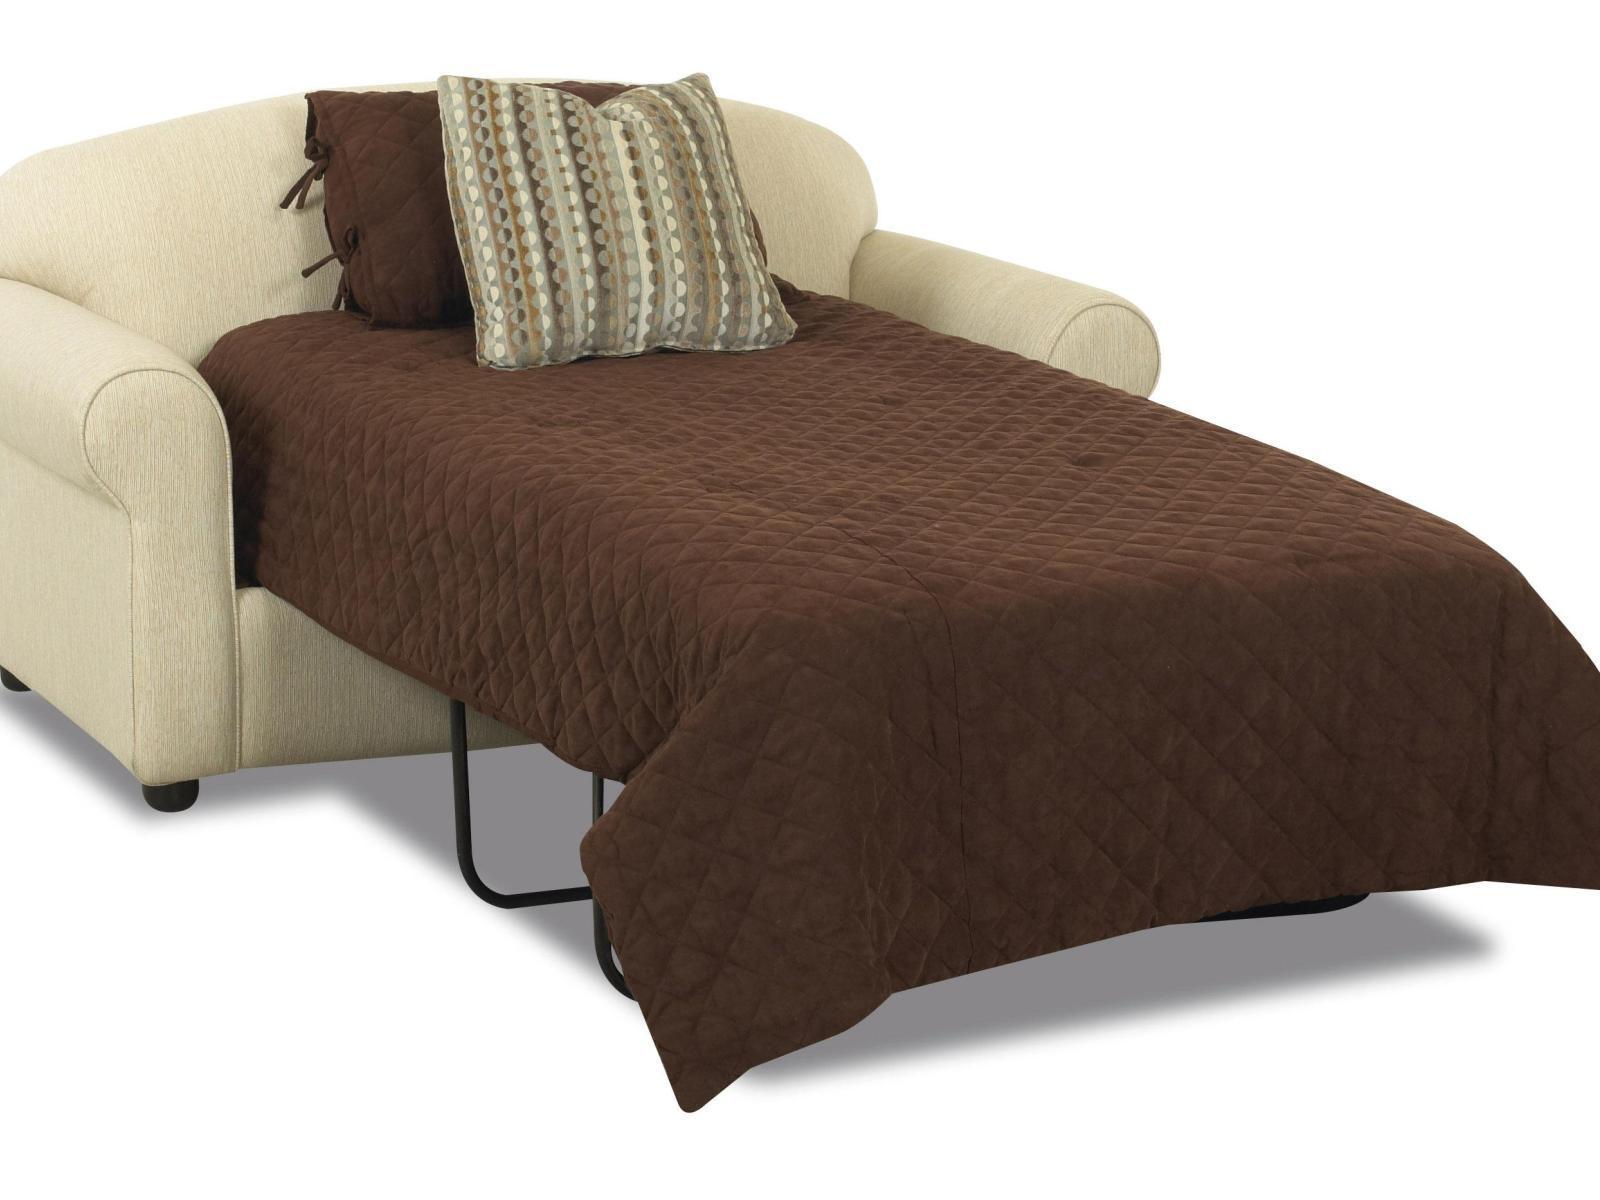 ☆▻ Sofa : 35 Loveseat Sleeper Sofa Bed Homezanin In Ikea Loveseat Sleeper Sofas (View 12 of 20)